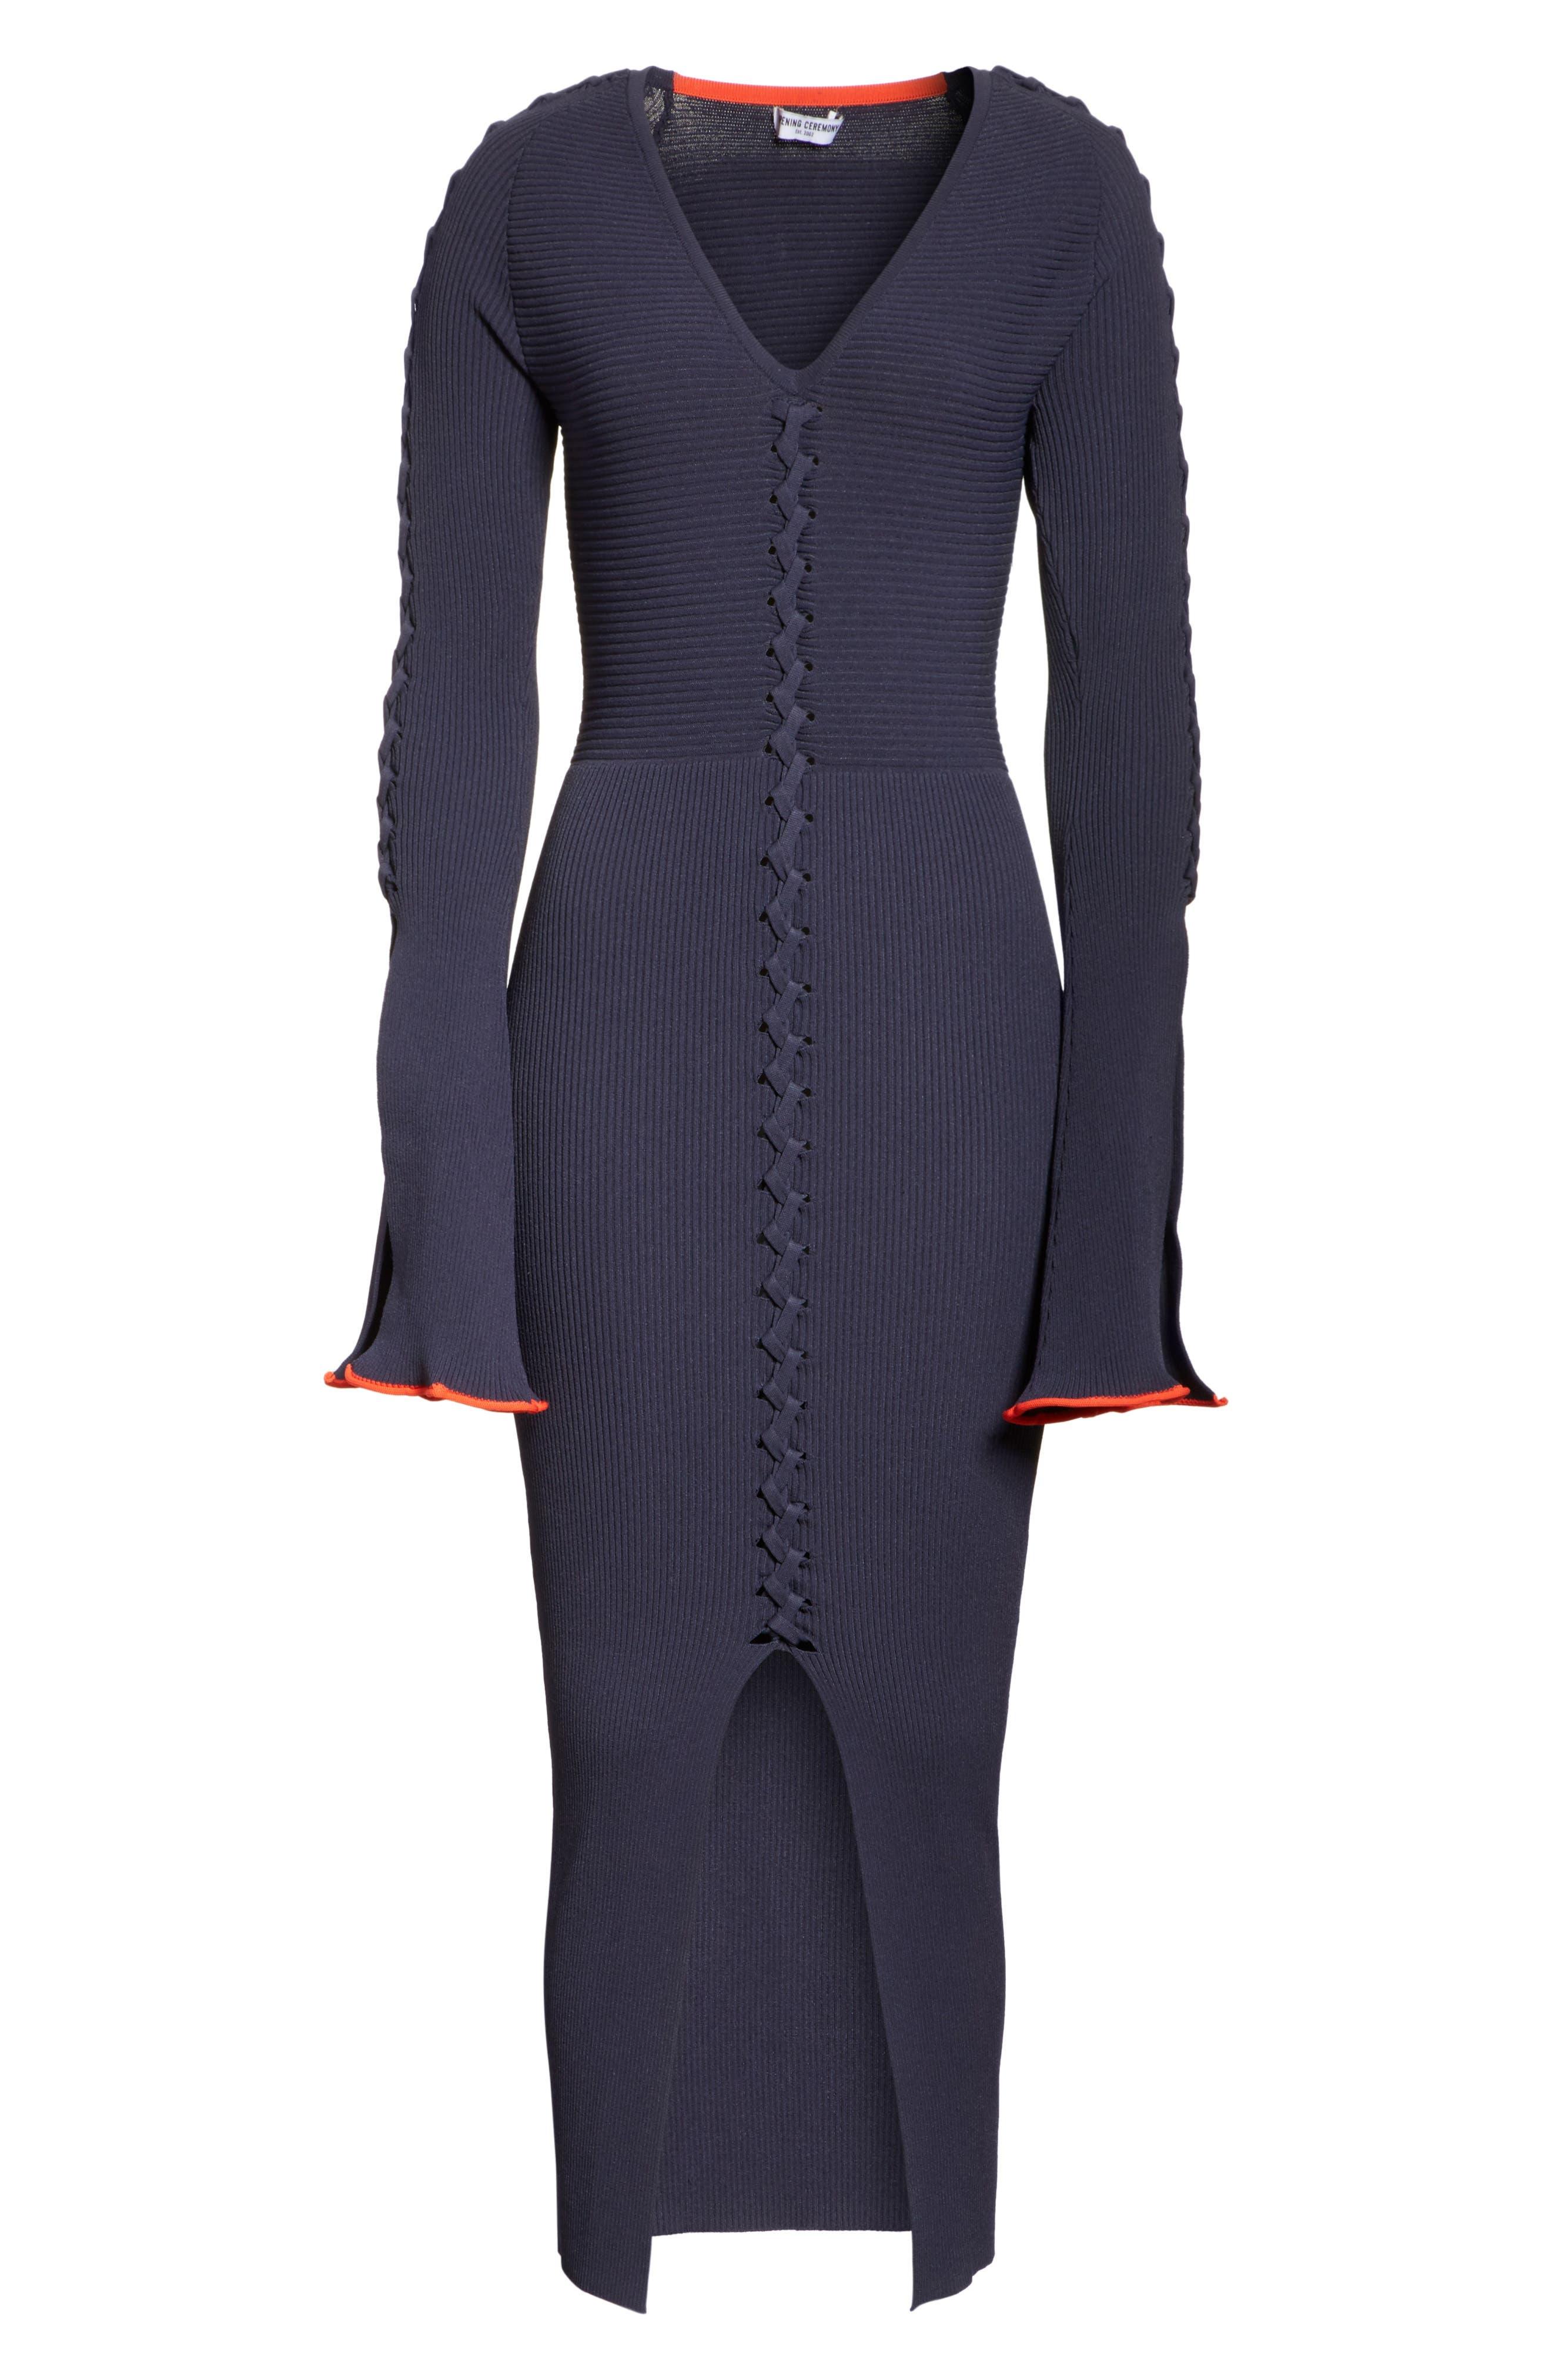 Criss Cross Dress,                             Alternate thumbnail 6, color,                             412